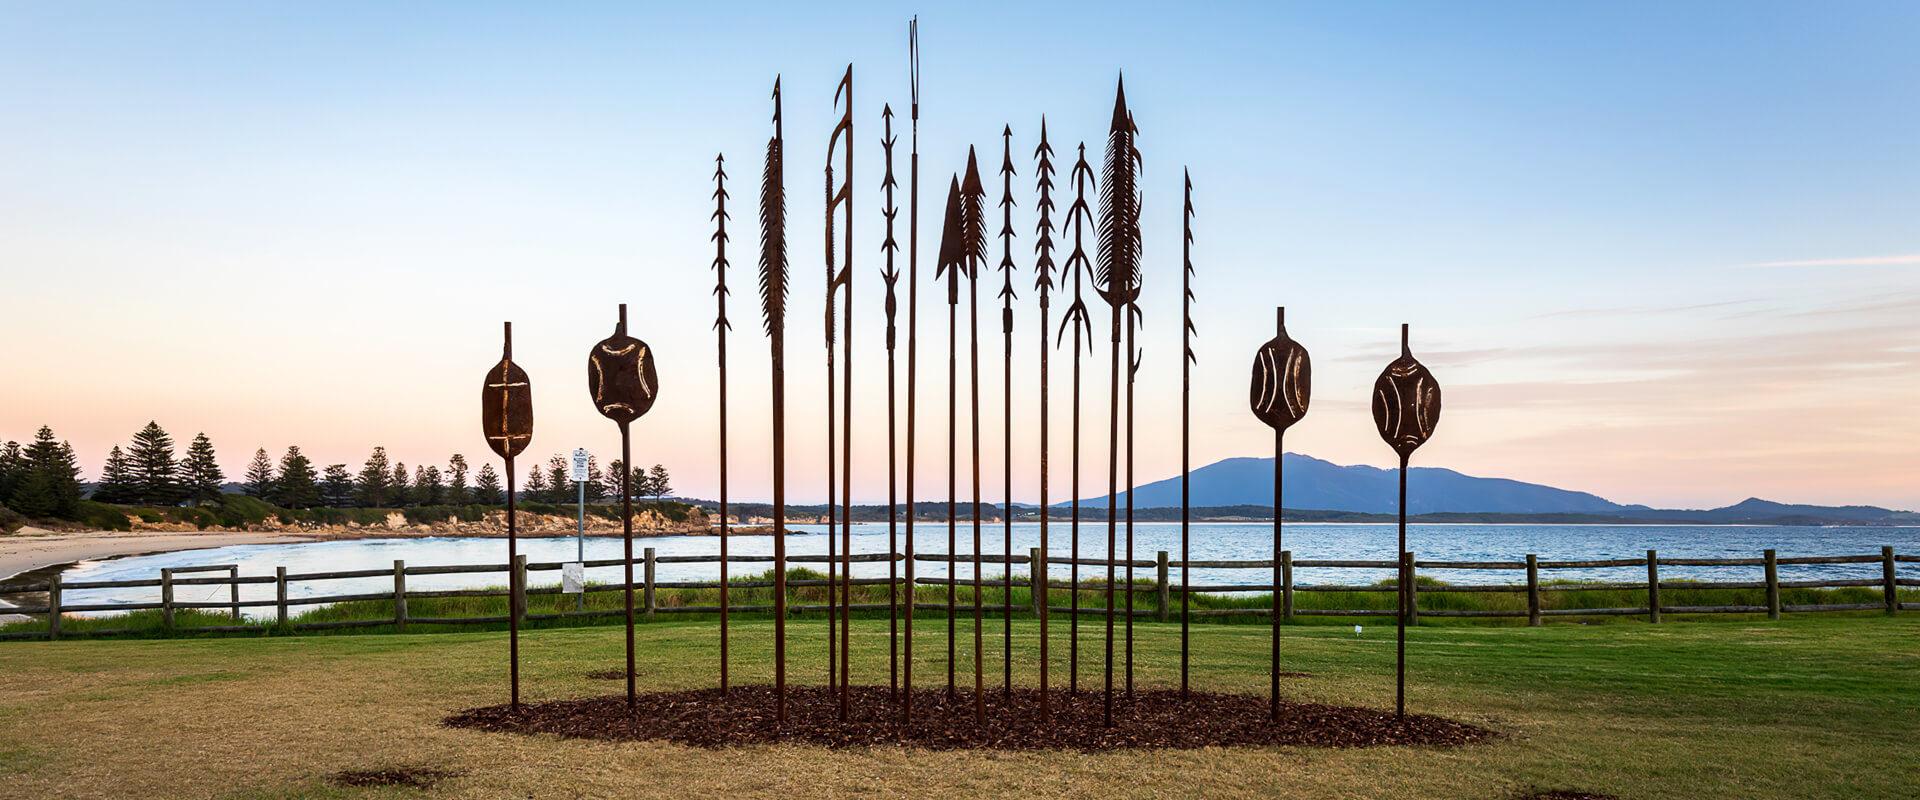 Sculpture: Bermagui